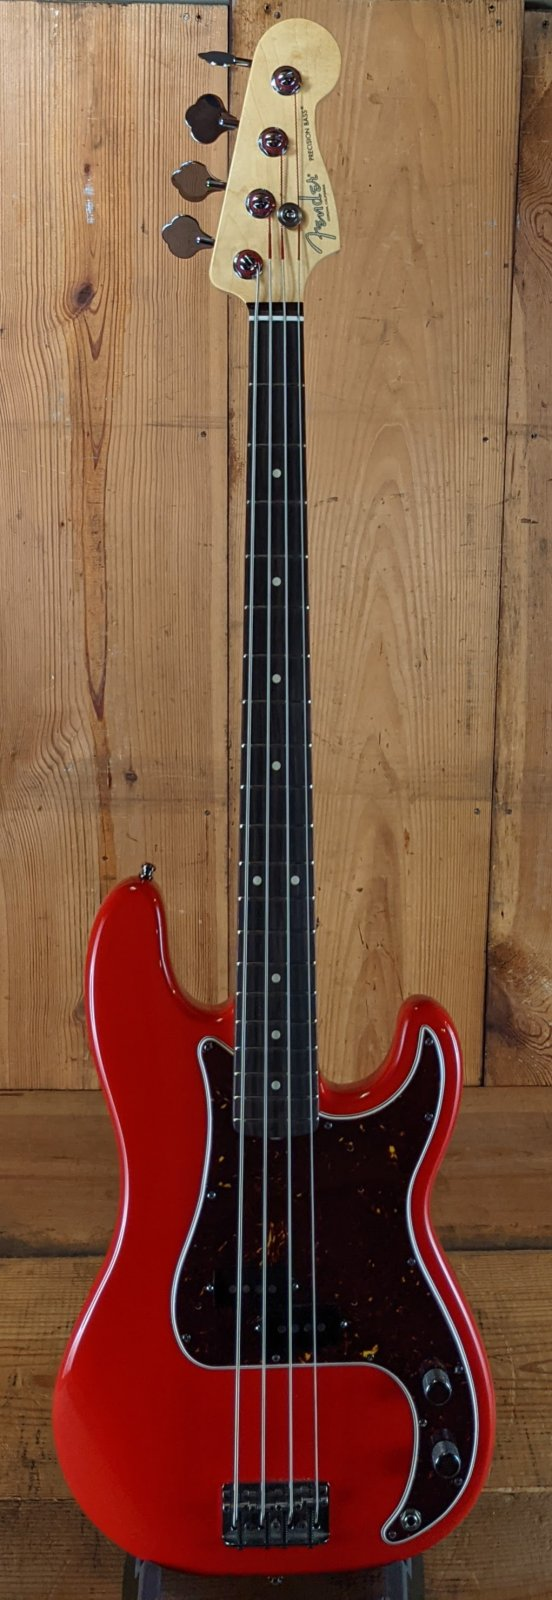 2000 Fender American Precision Bass